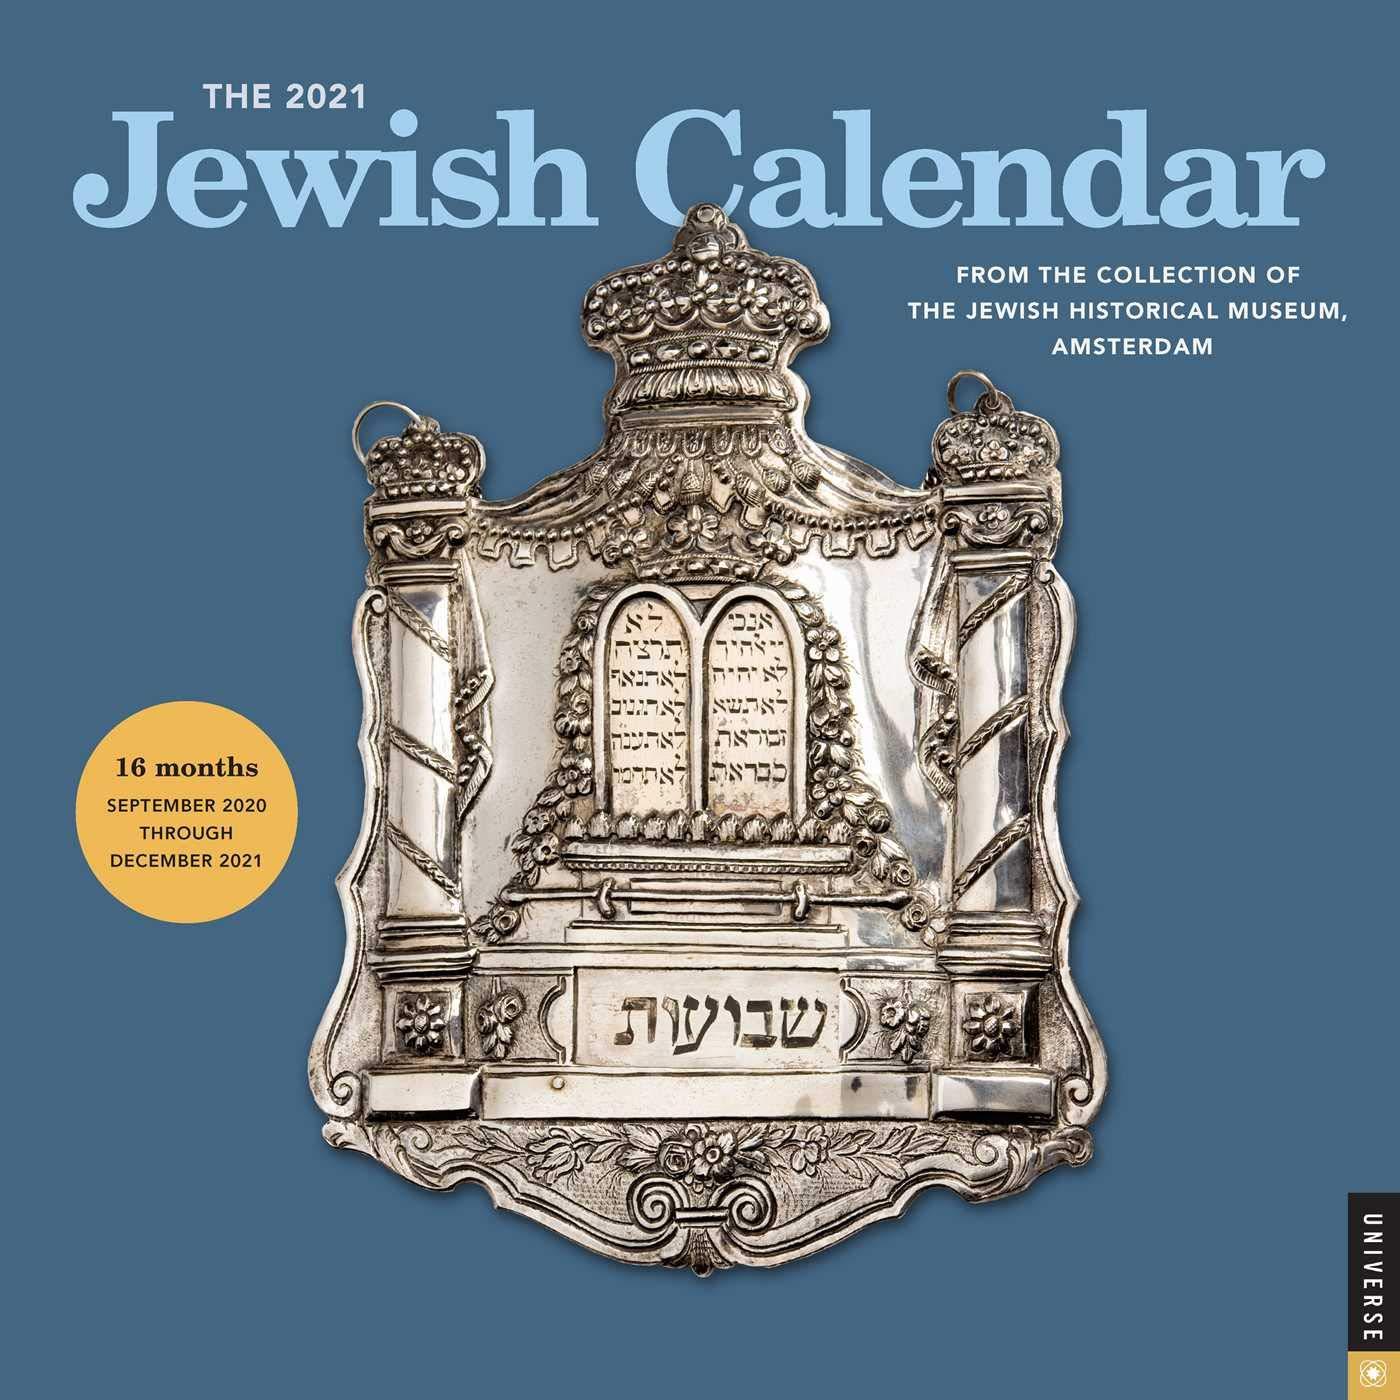 Hebrew Calendar 2021 The 2021 Jewish Calendar 16 Month Wall Calendar: Jewish Year 5781